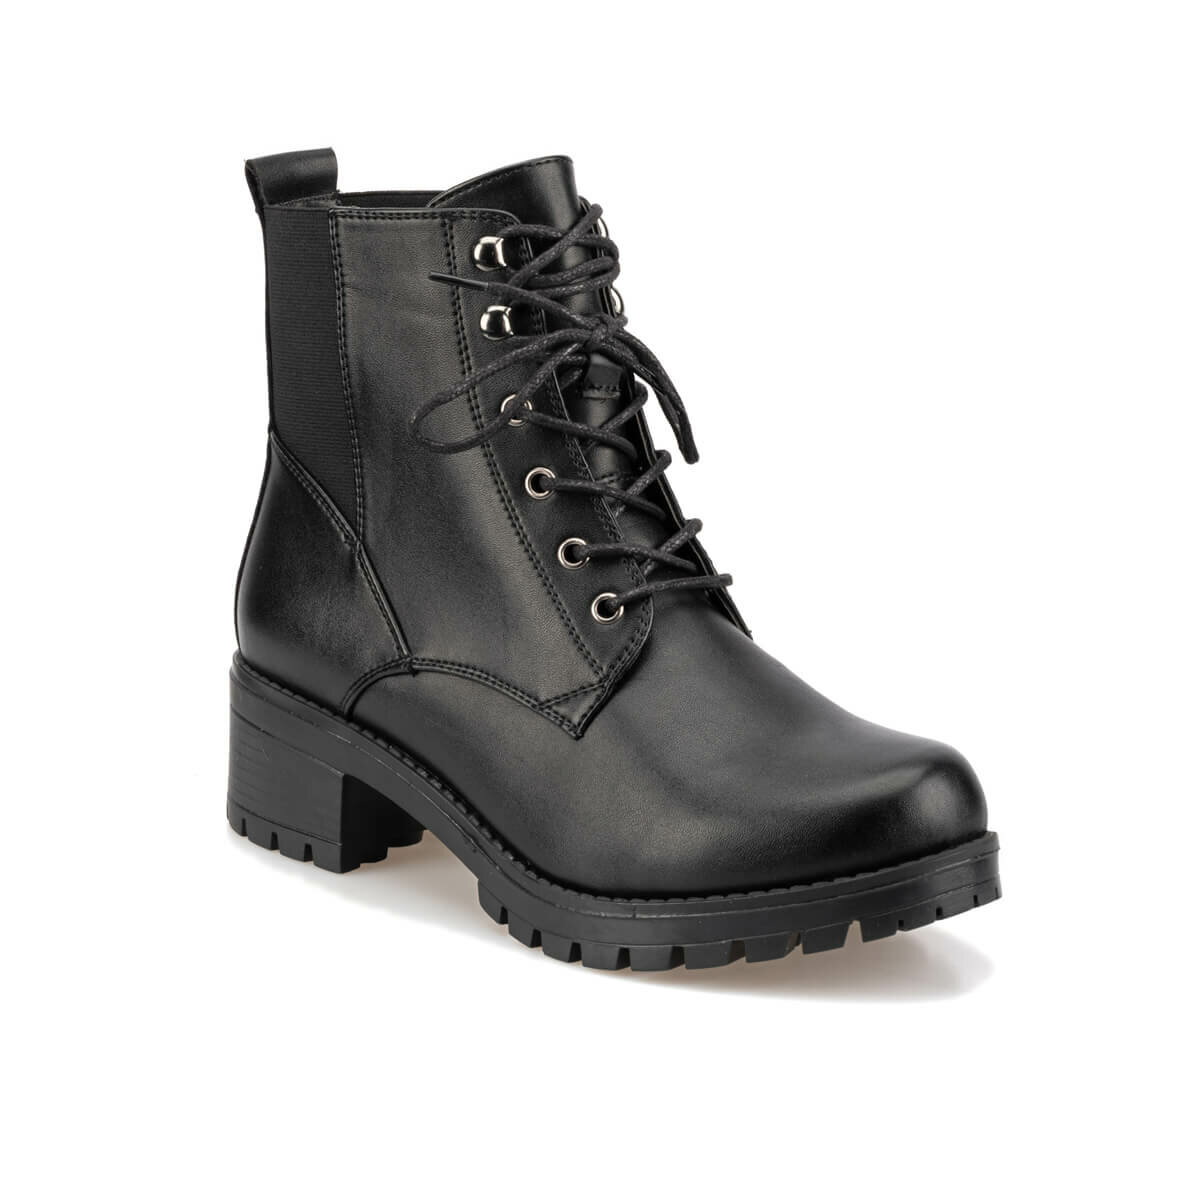 FLO 92.309258.Z Black Women 'S Casual Boots Polaris